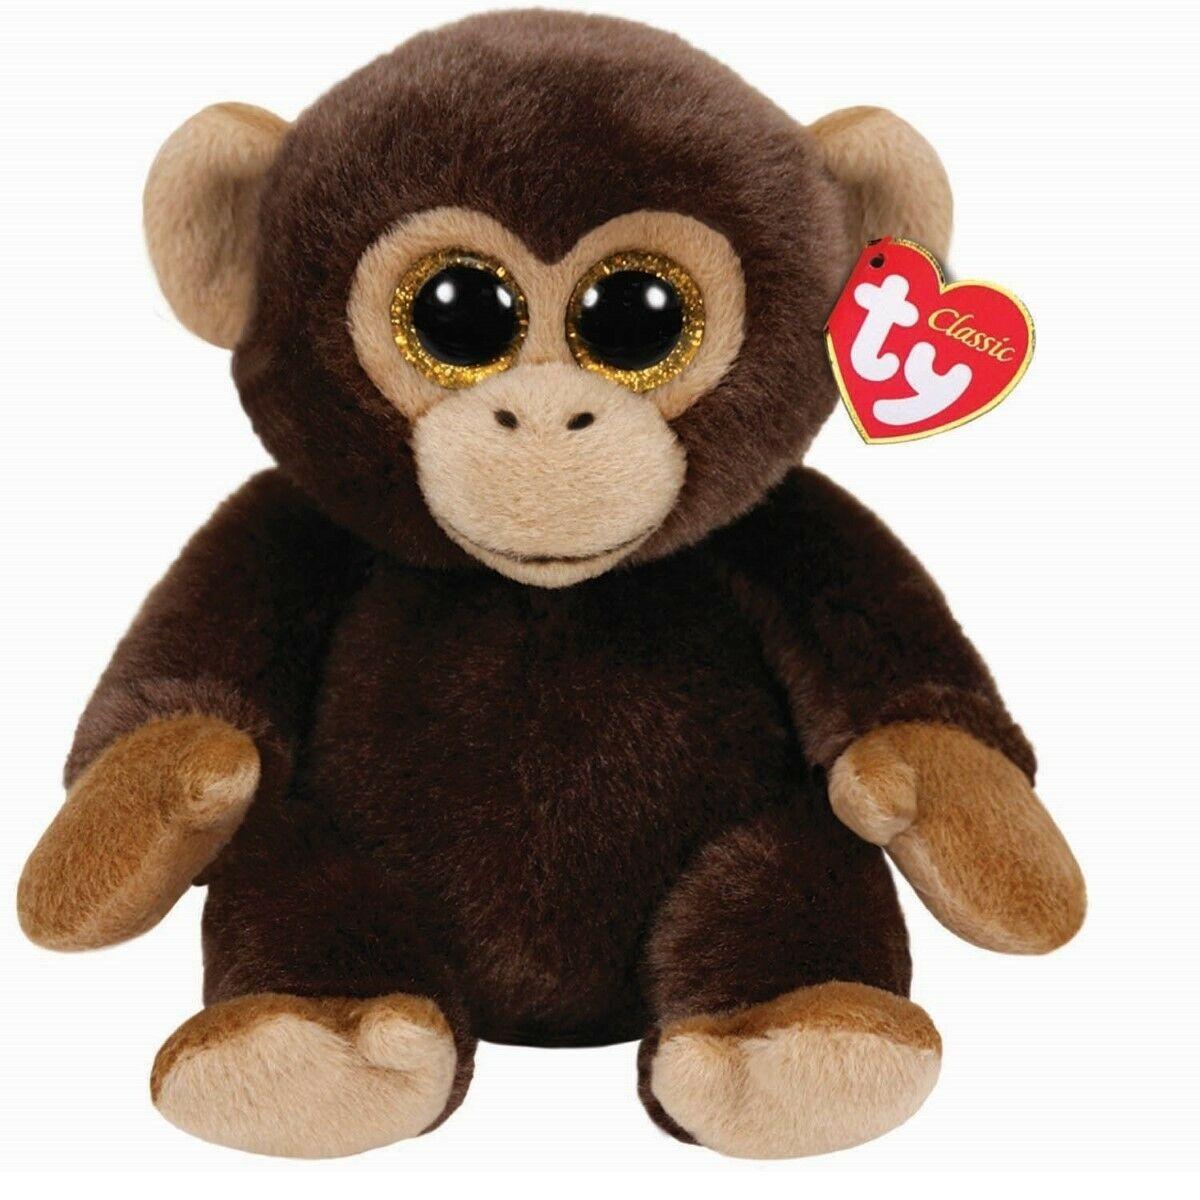 Carletto plišani majmun 33 cm